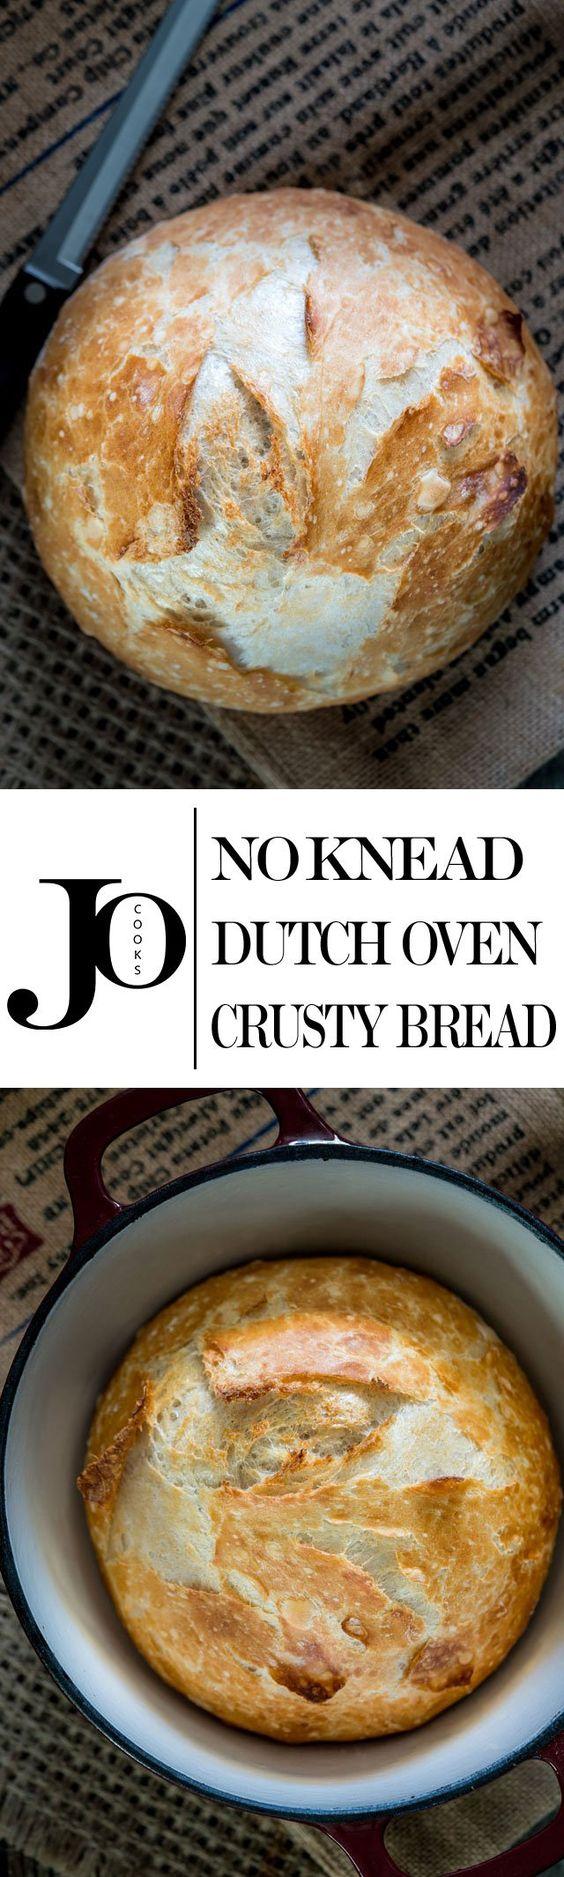 No Knead Dutch Oven Crusty Bread - no kneading required, 4 ...